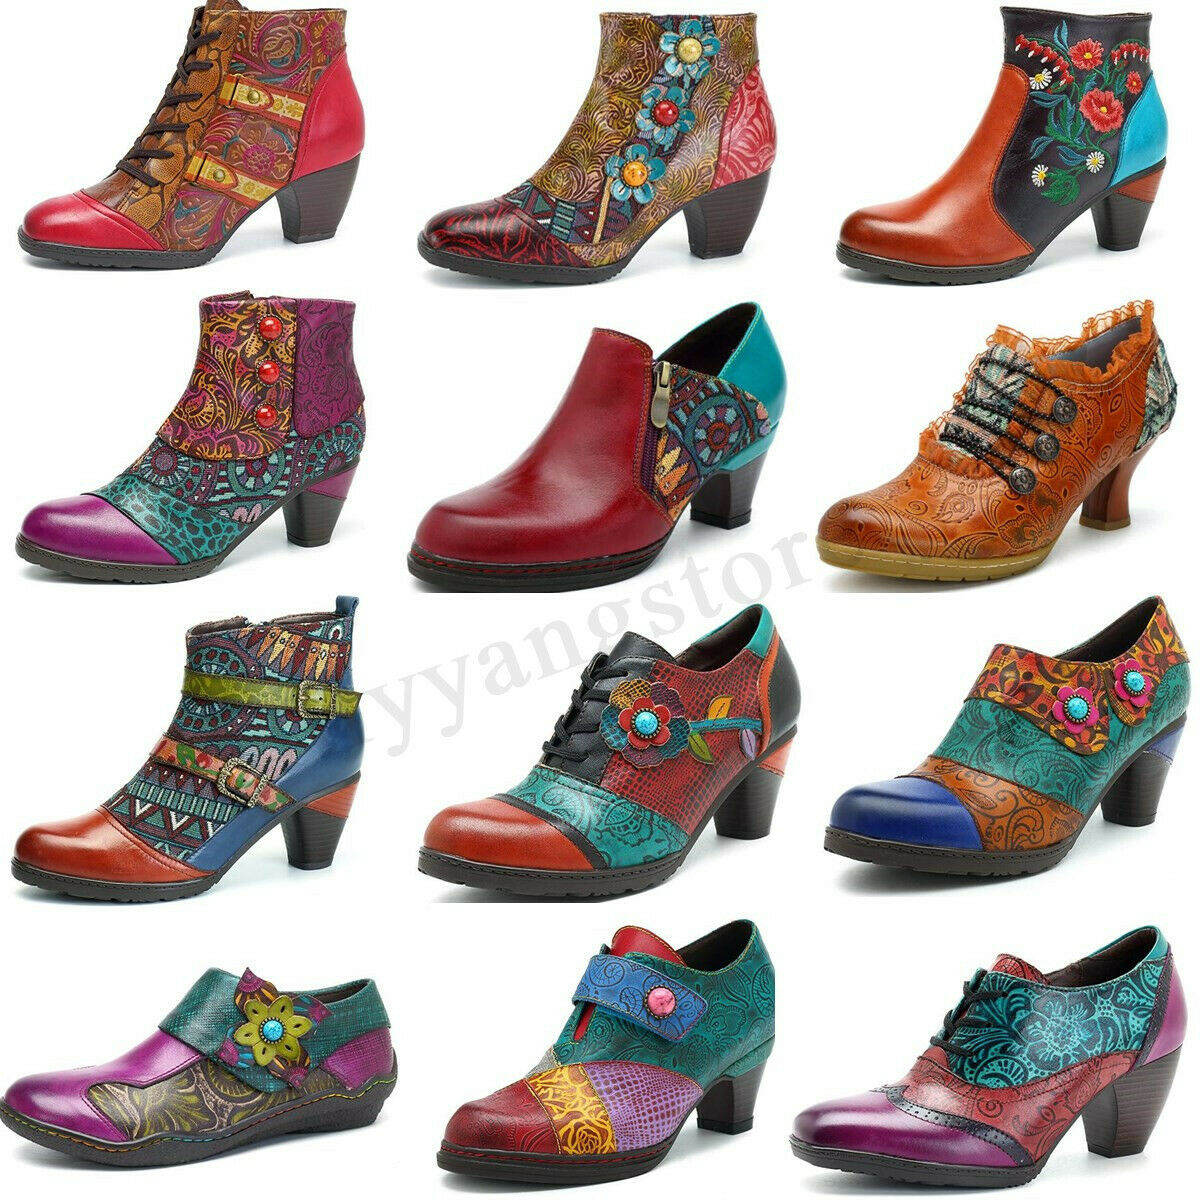 SOCOFY Women's Zipper Ankle Boots Mid Heel Leather Pumps Splicing Handmade